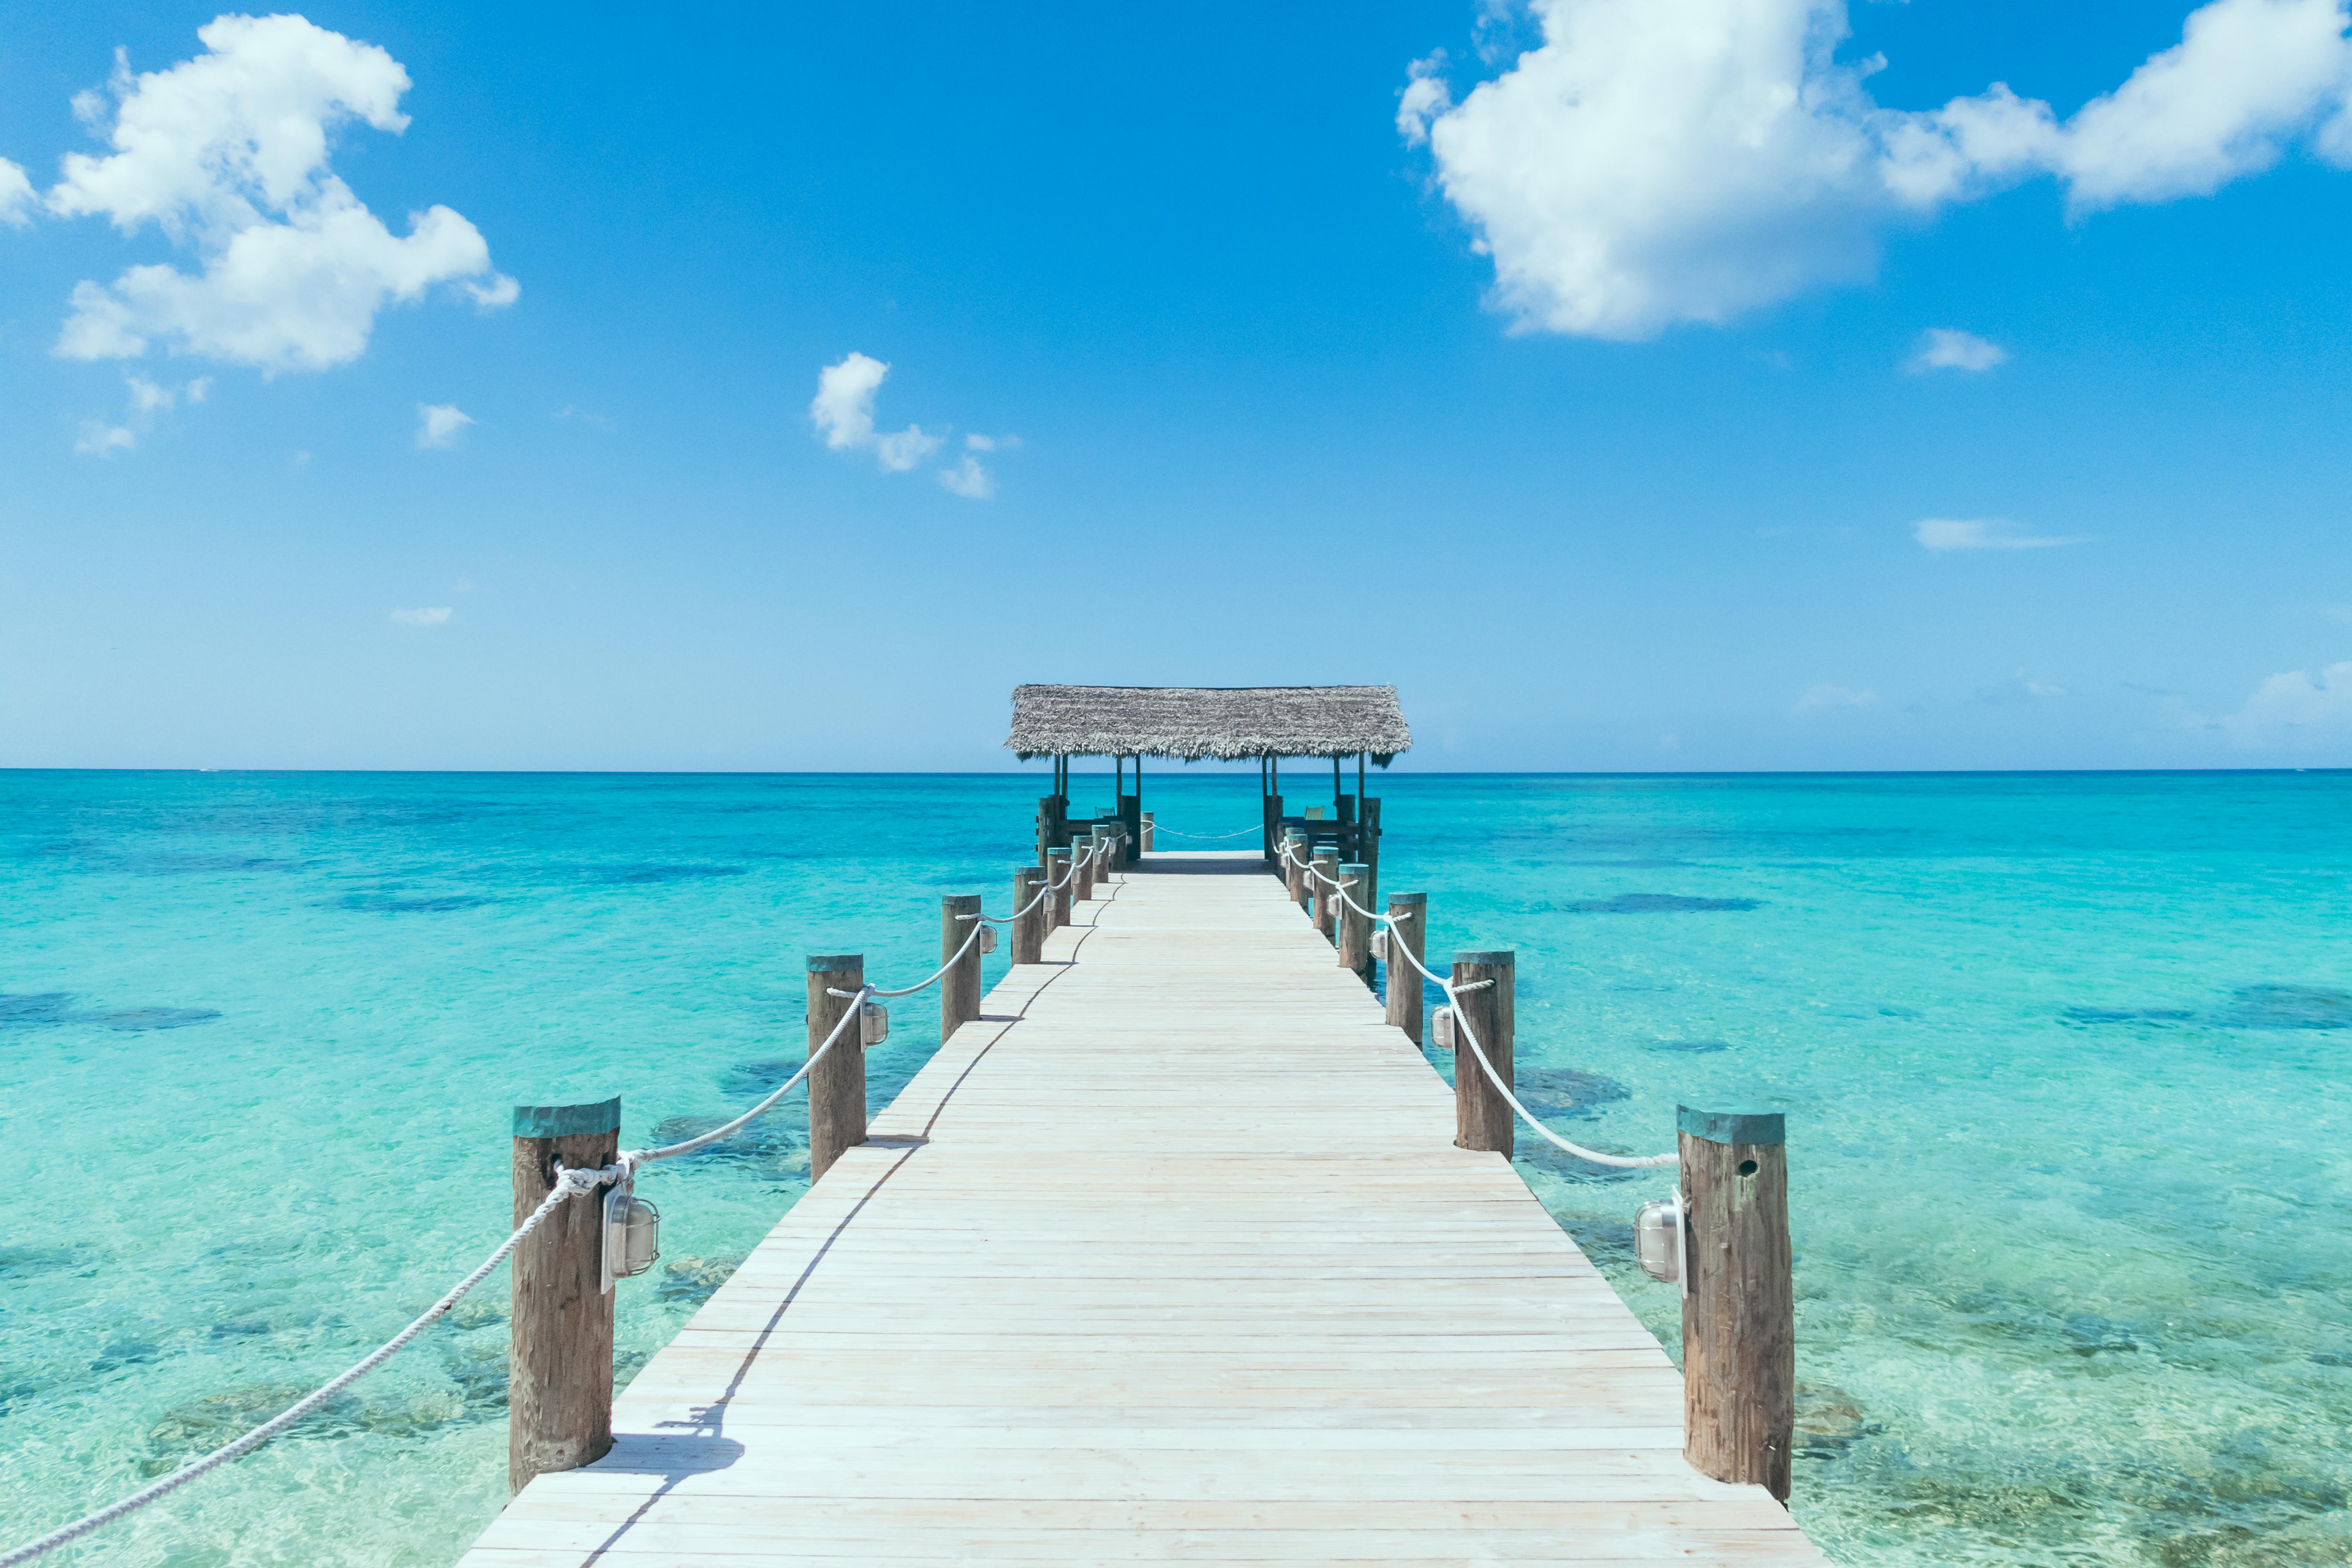 Island Pier On Perfect Tropical Beach Wi